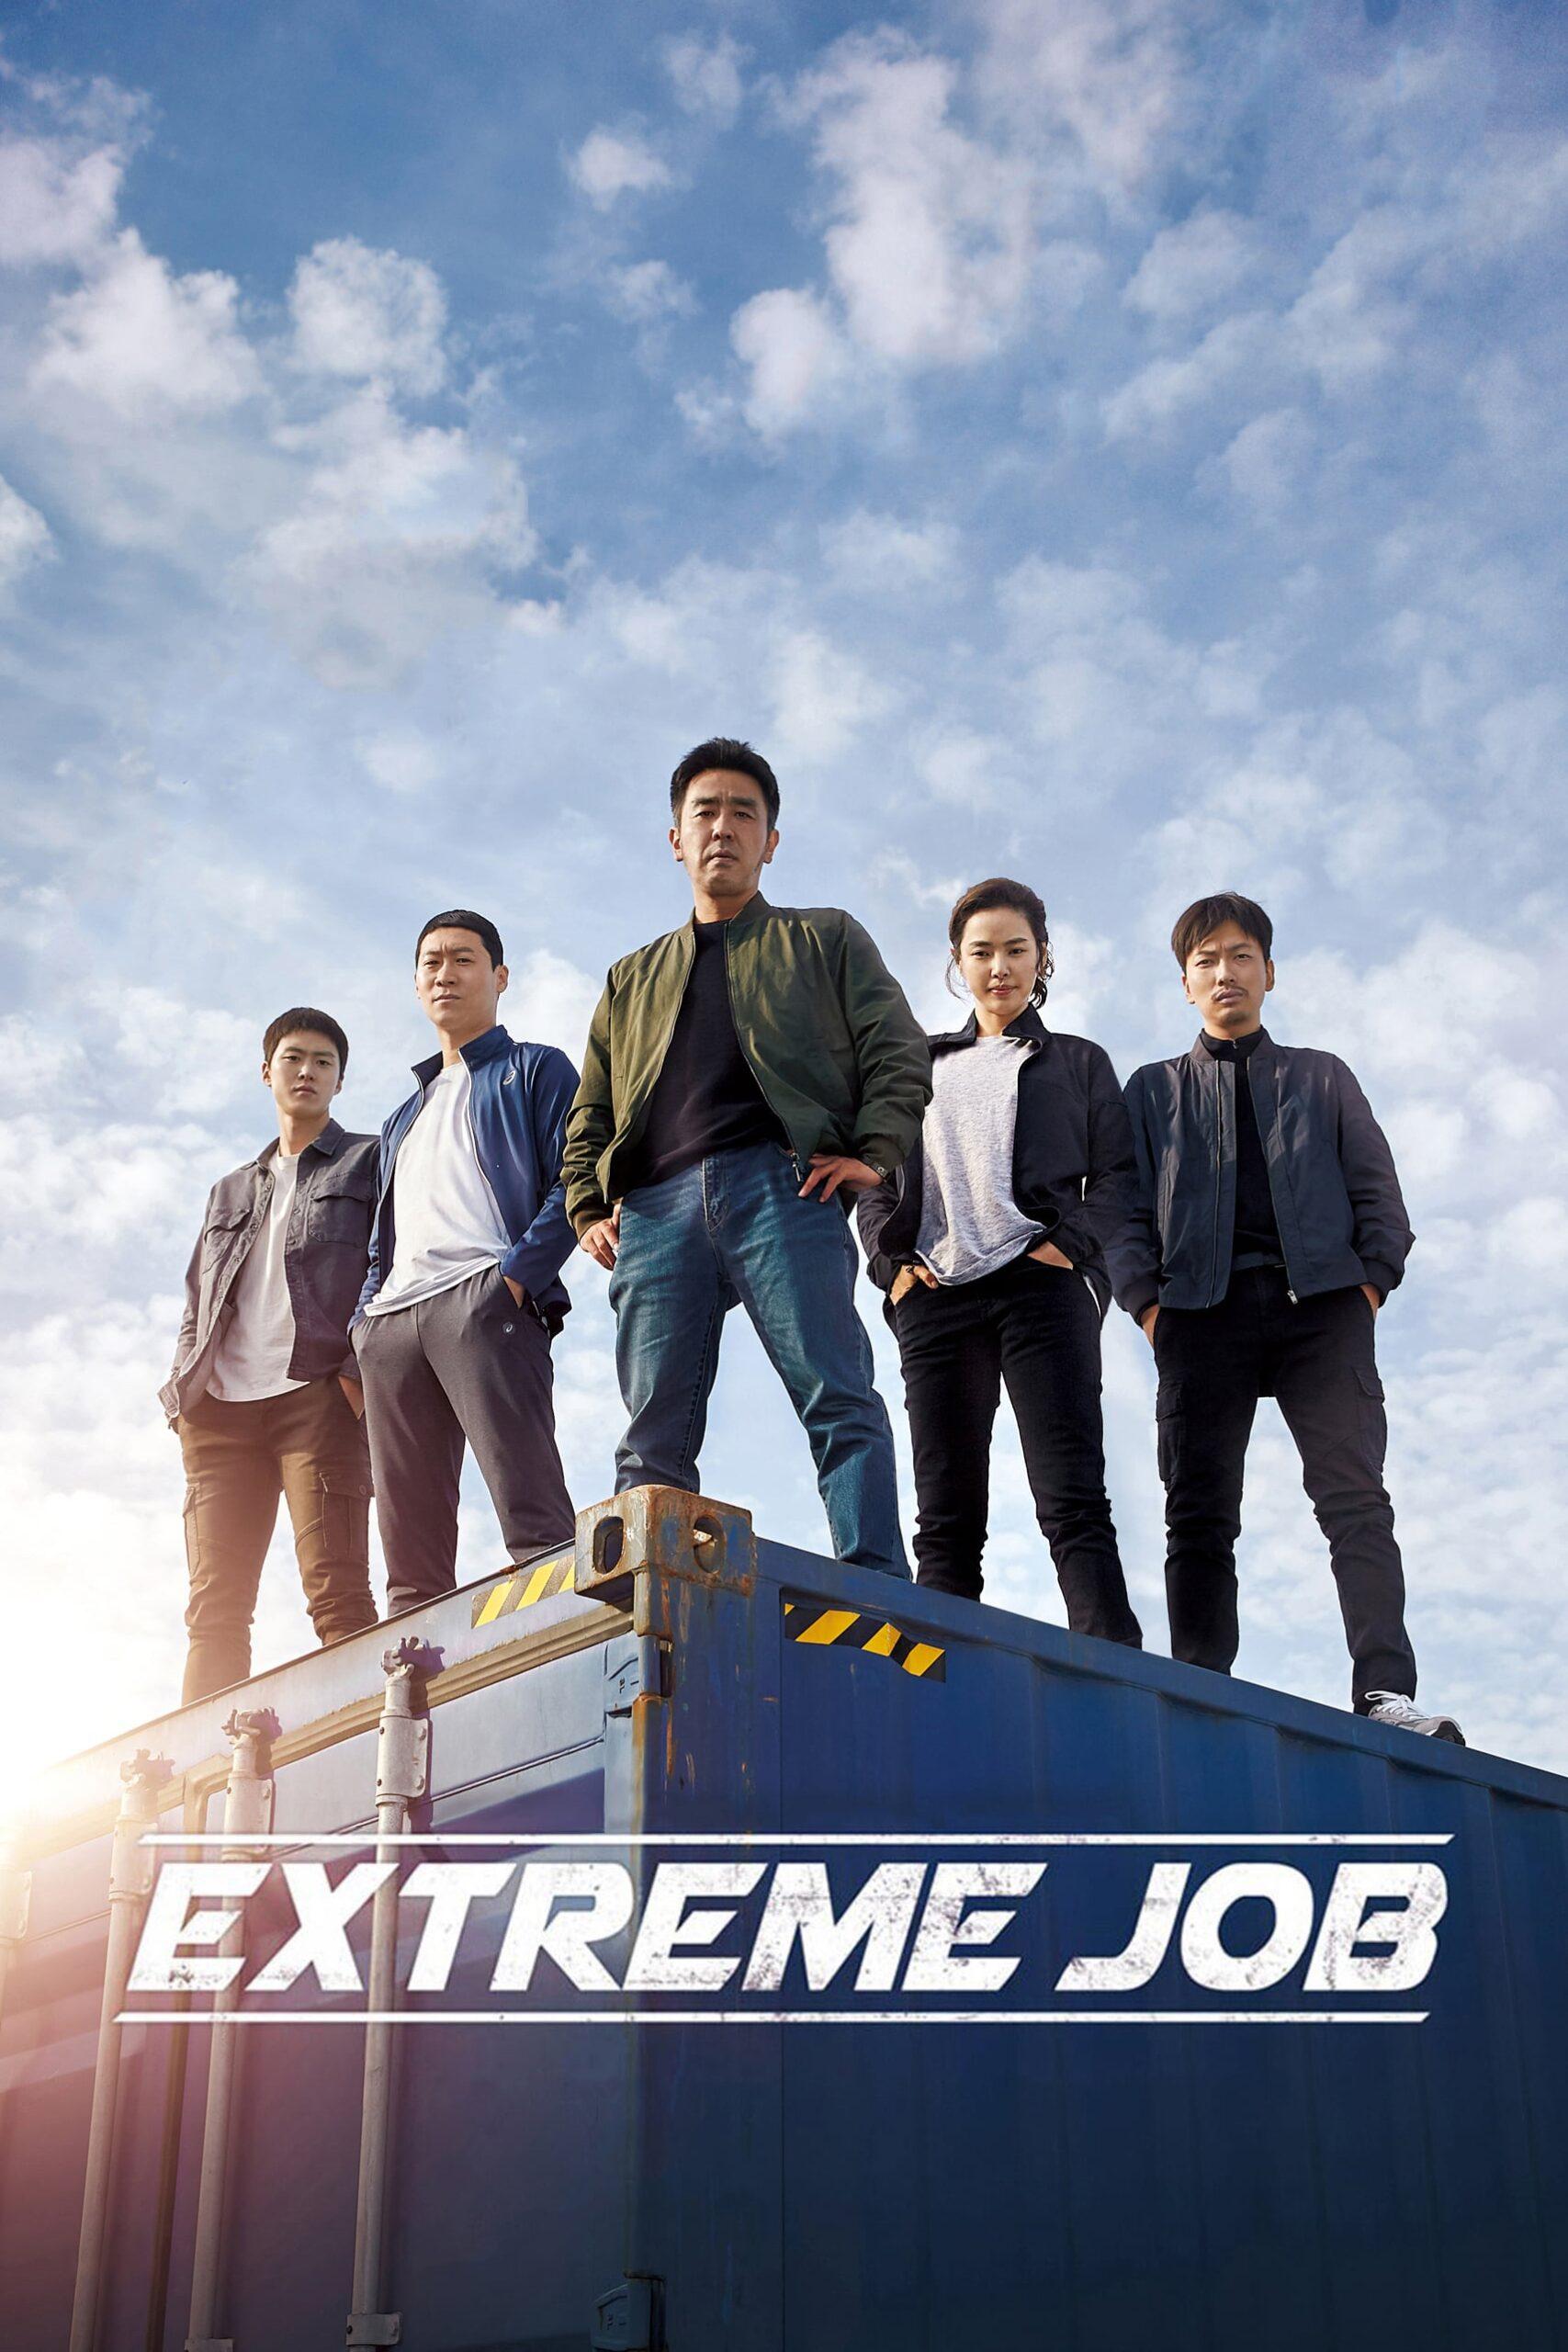 Extreme Job Movie Streaming Online